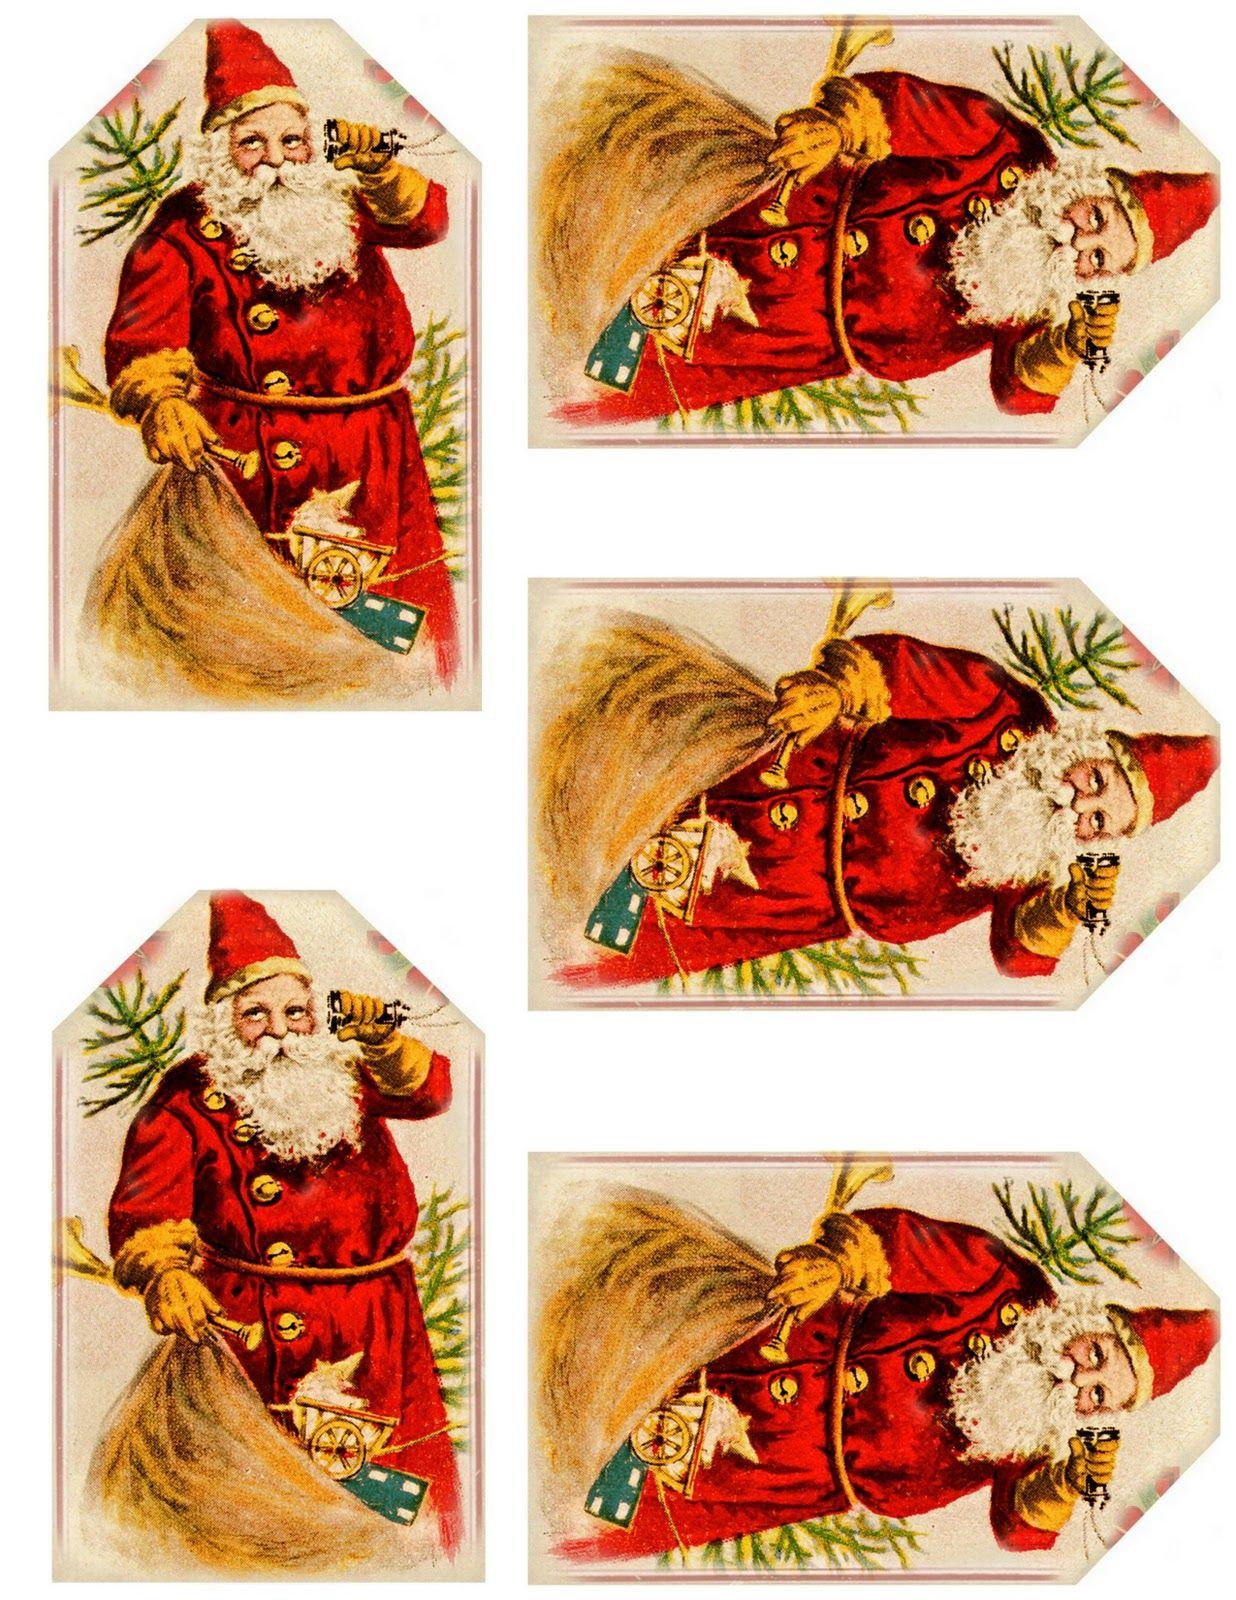 Luxe Image De Noel Vintage A Imprimer